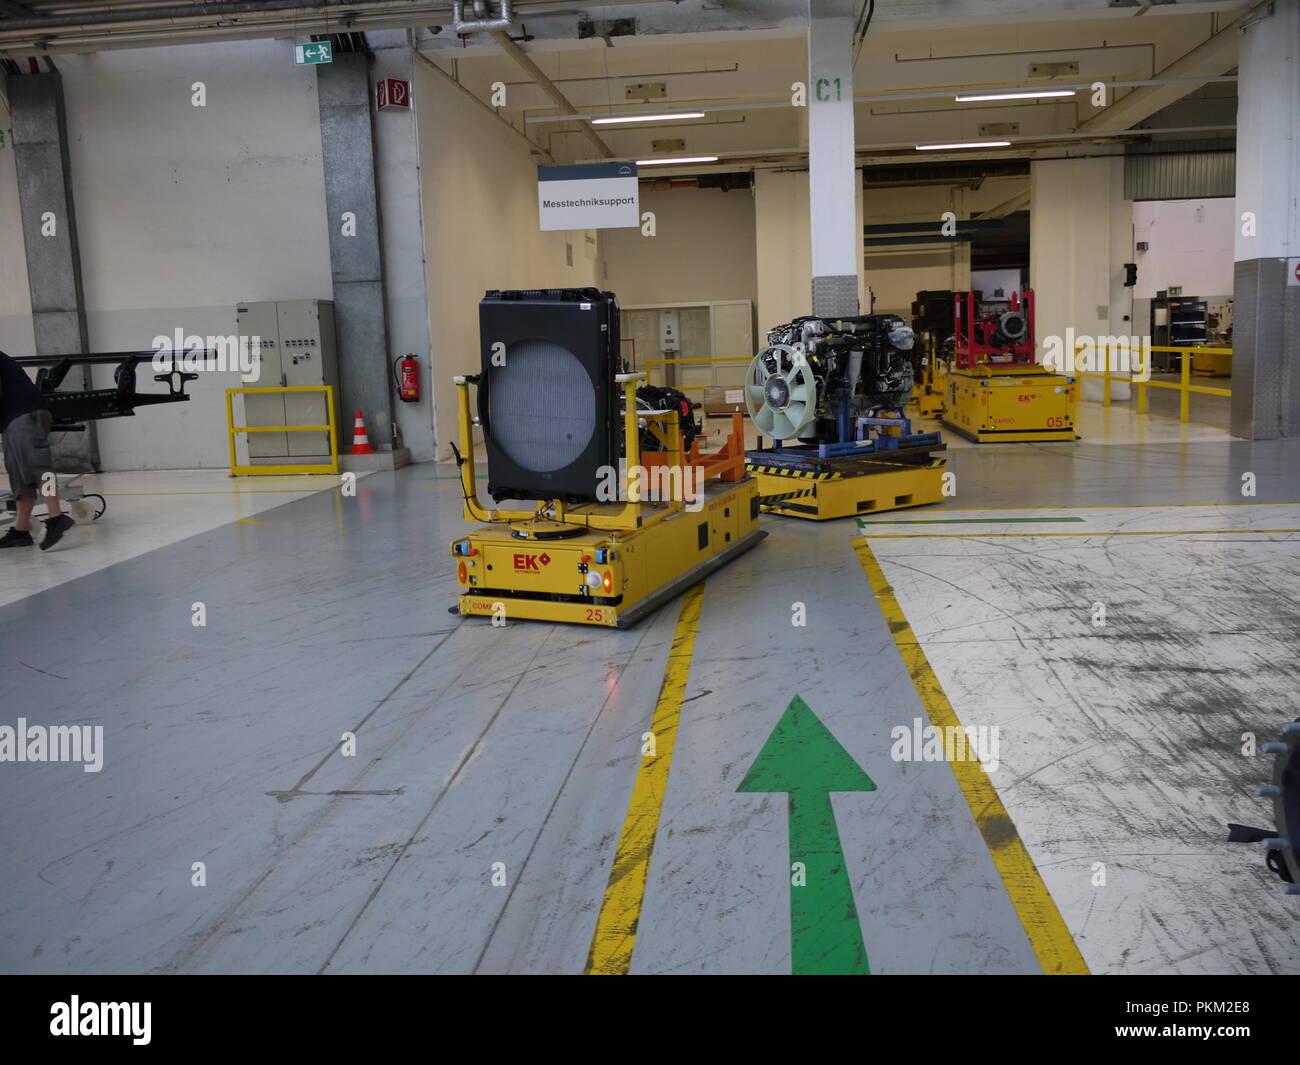 Autonomus carrier in Man truck factory, in Steyr (Austria) - Stock Image